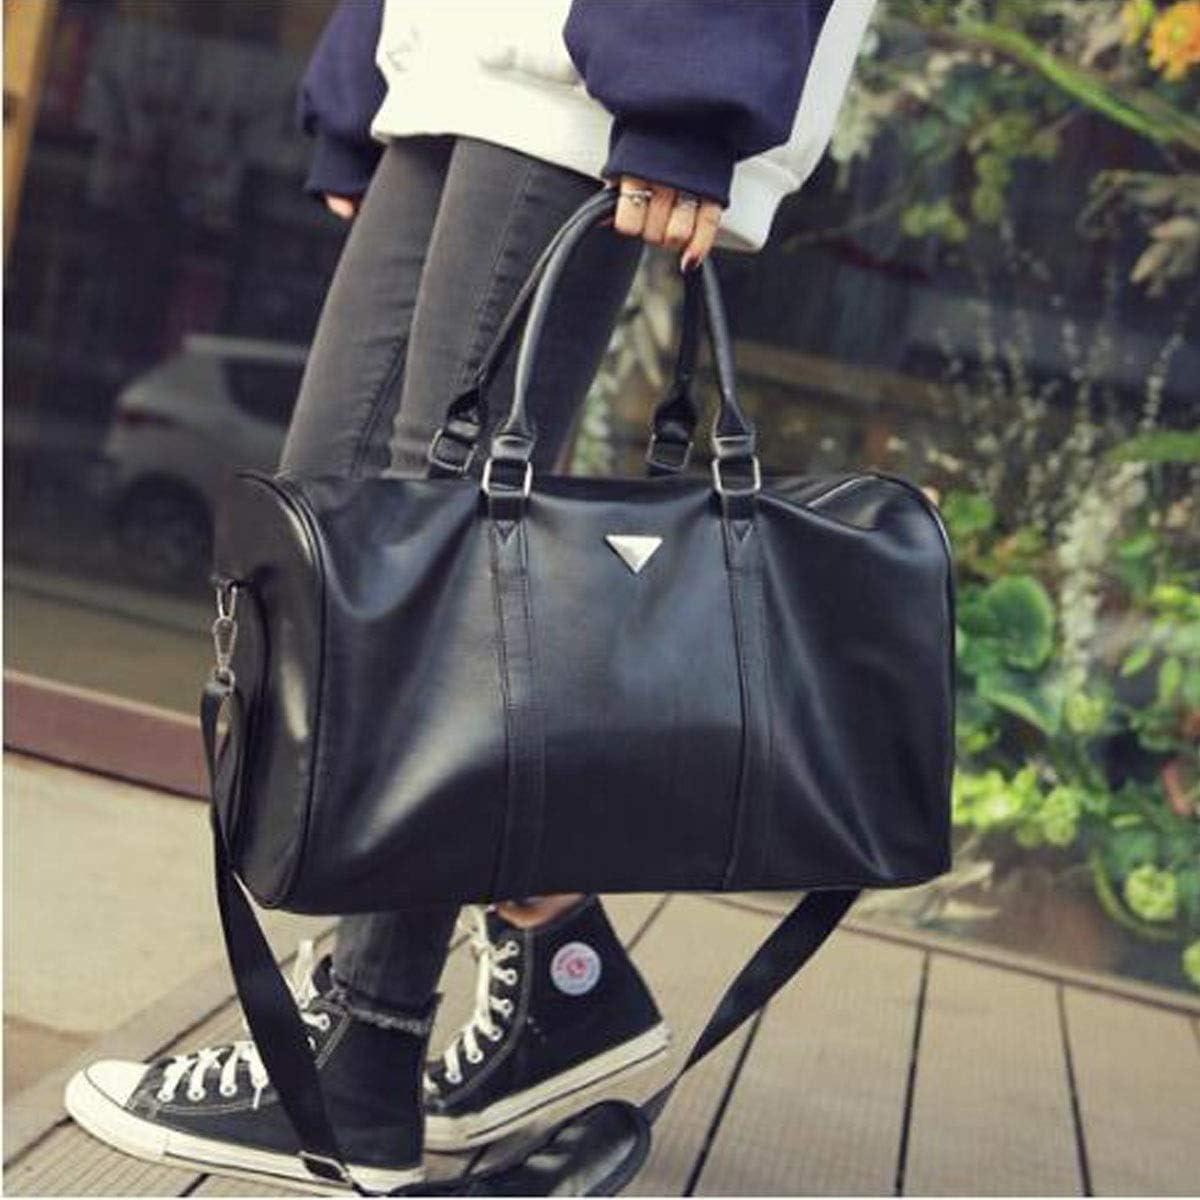 New Short-Distance Travel Bag Kaiyitong Sports Bag Large-Capacity Duffel Bag Black Large Size: 422024cm Color : Black Female Hand-held Waterproof Gym Bag Mens Business Bag